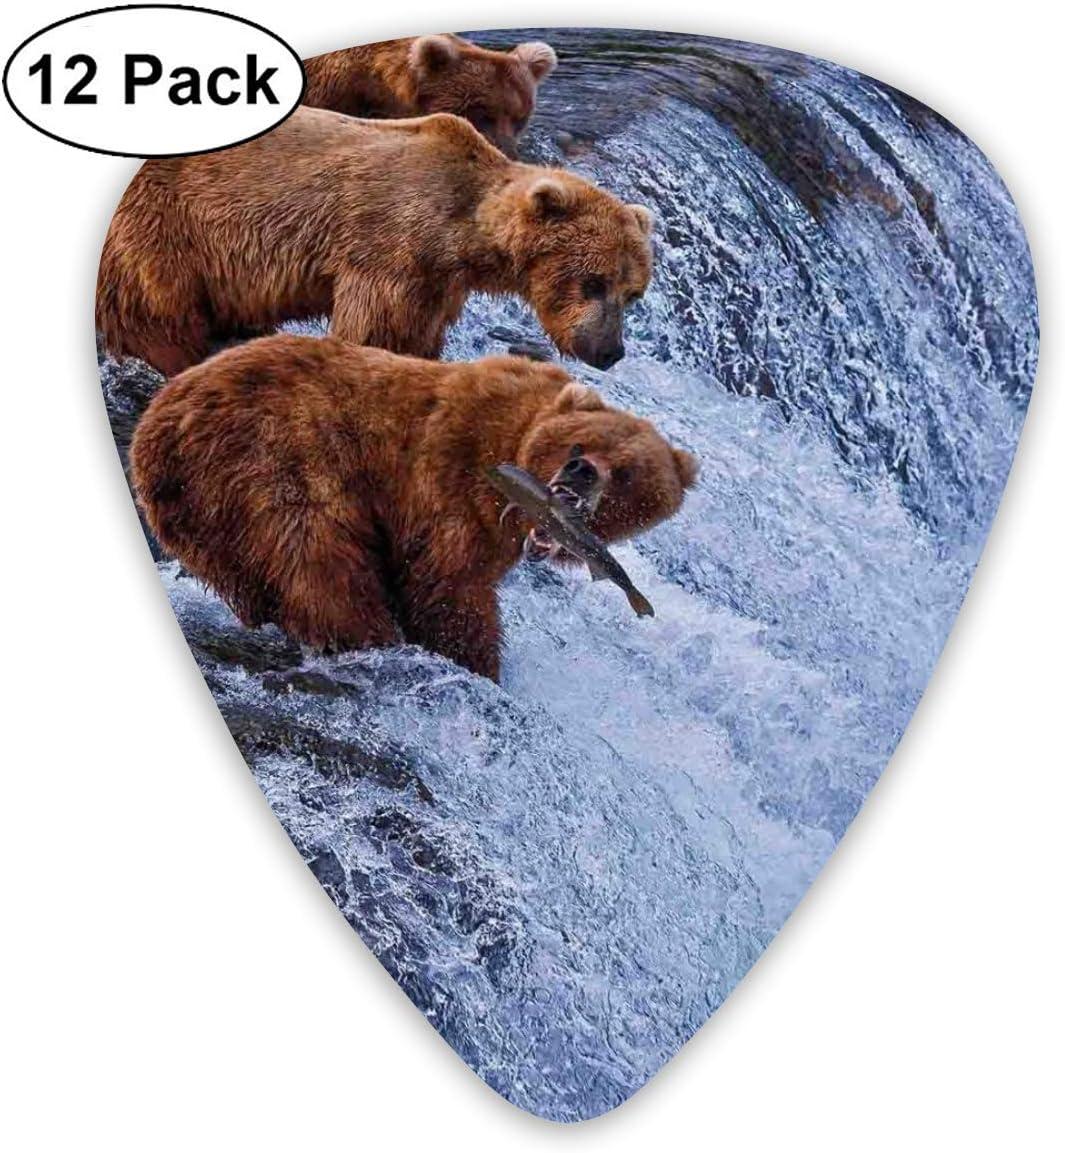 Púas de guitarra Osos grizzly Pesca en cascadas del río Cascade Alaska Nature Camp View, para bajo Guitarras eléctricas acústicas-12 Pack